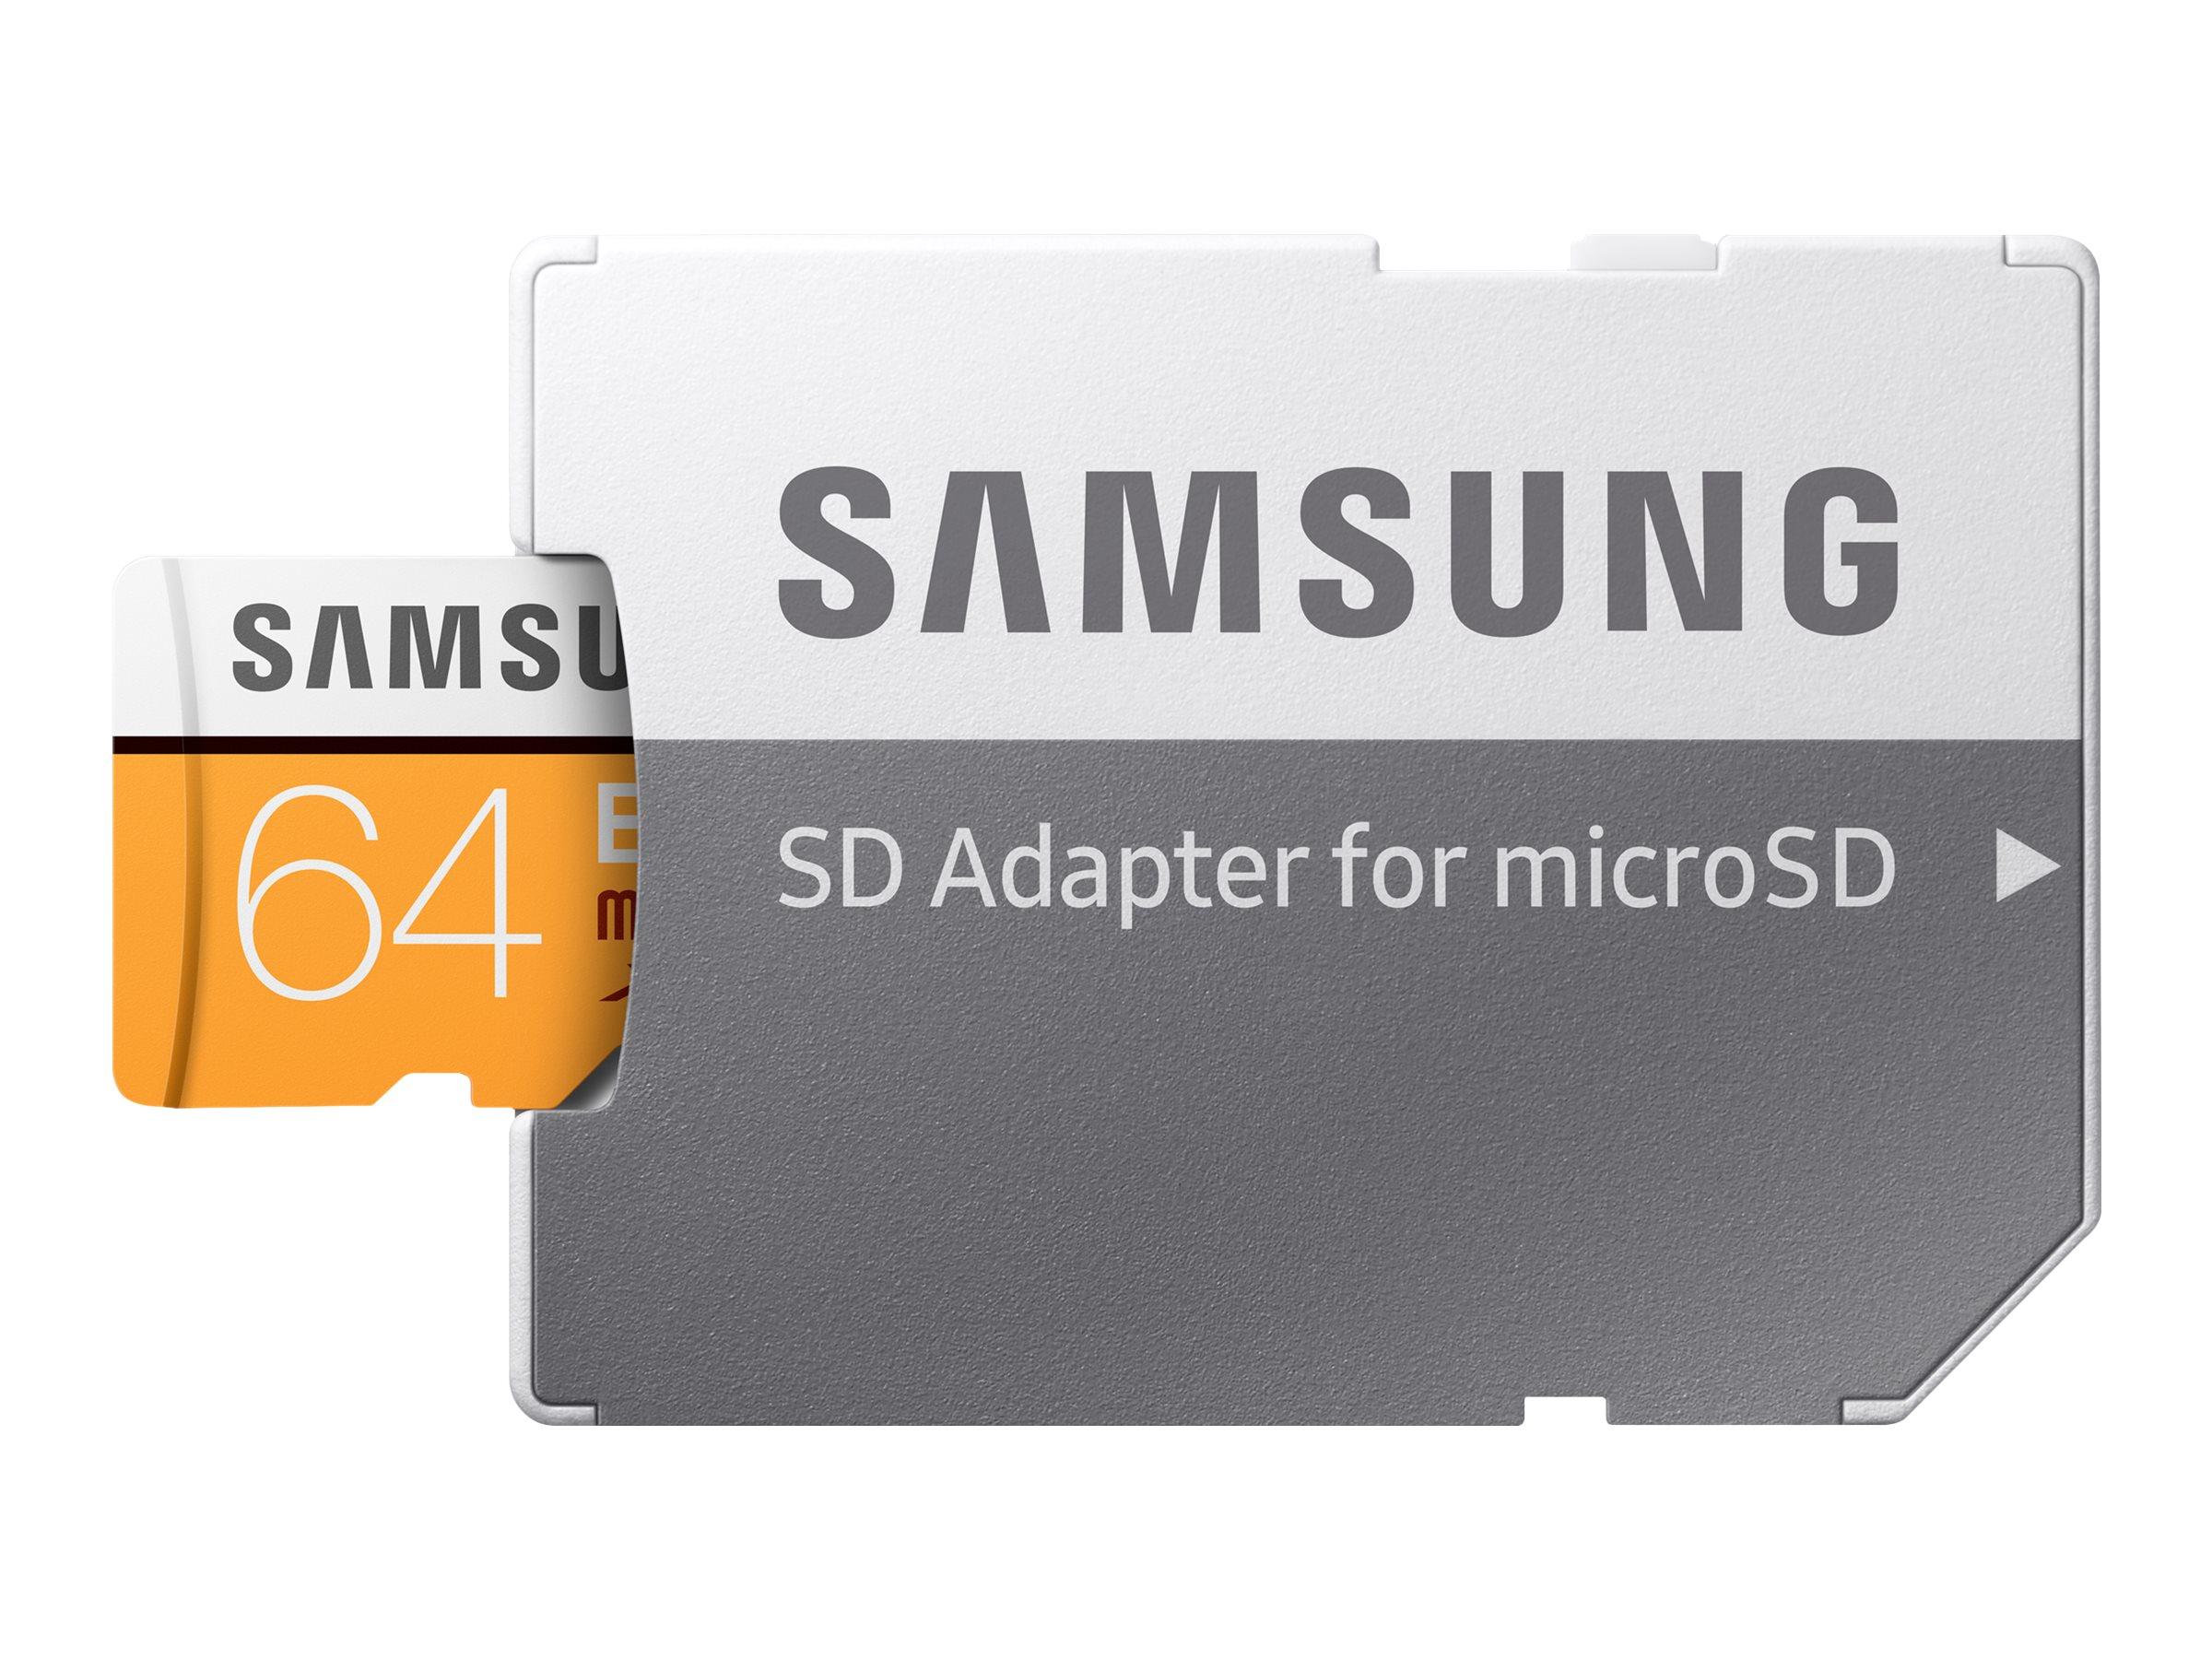 Samsung EVO MB-MP64GA - Flash-Speicherkarte (microSDXC-an-SD-Adapter inbegriffen) - 64 GB - UHS-I U3 / Class10 - microSDXC UHS-I